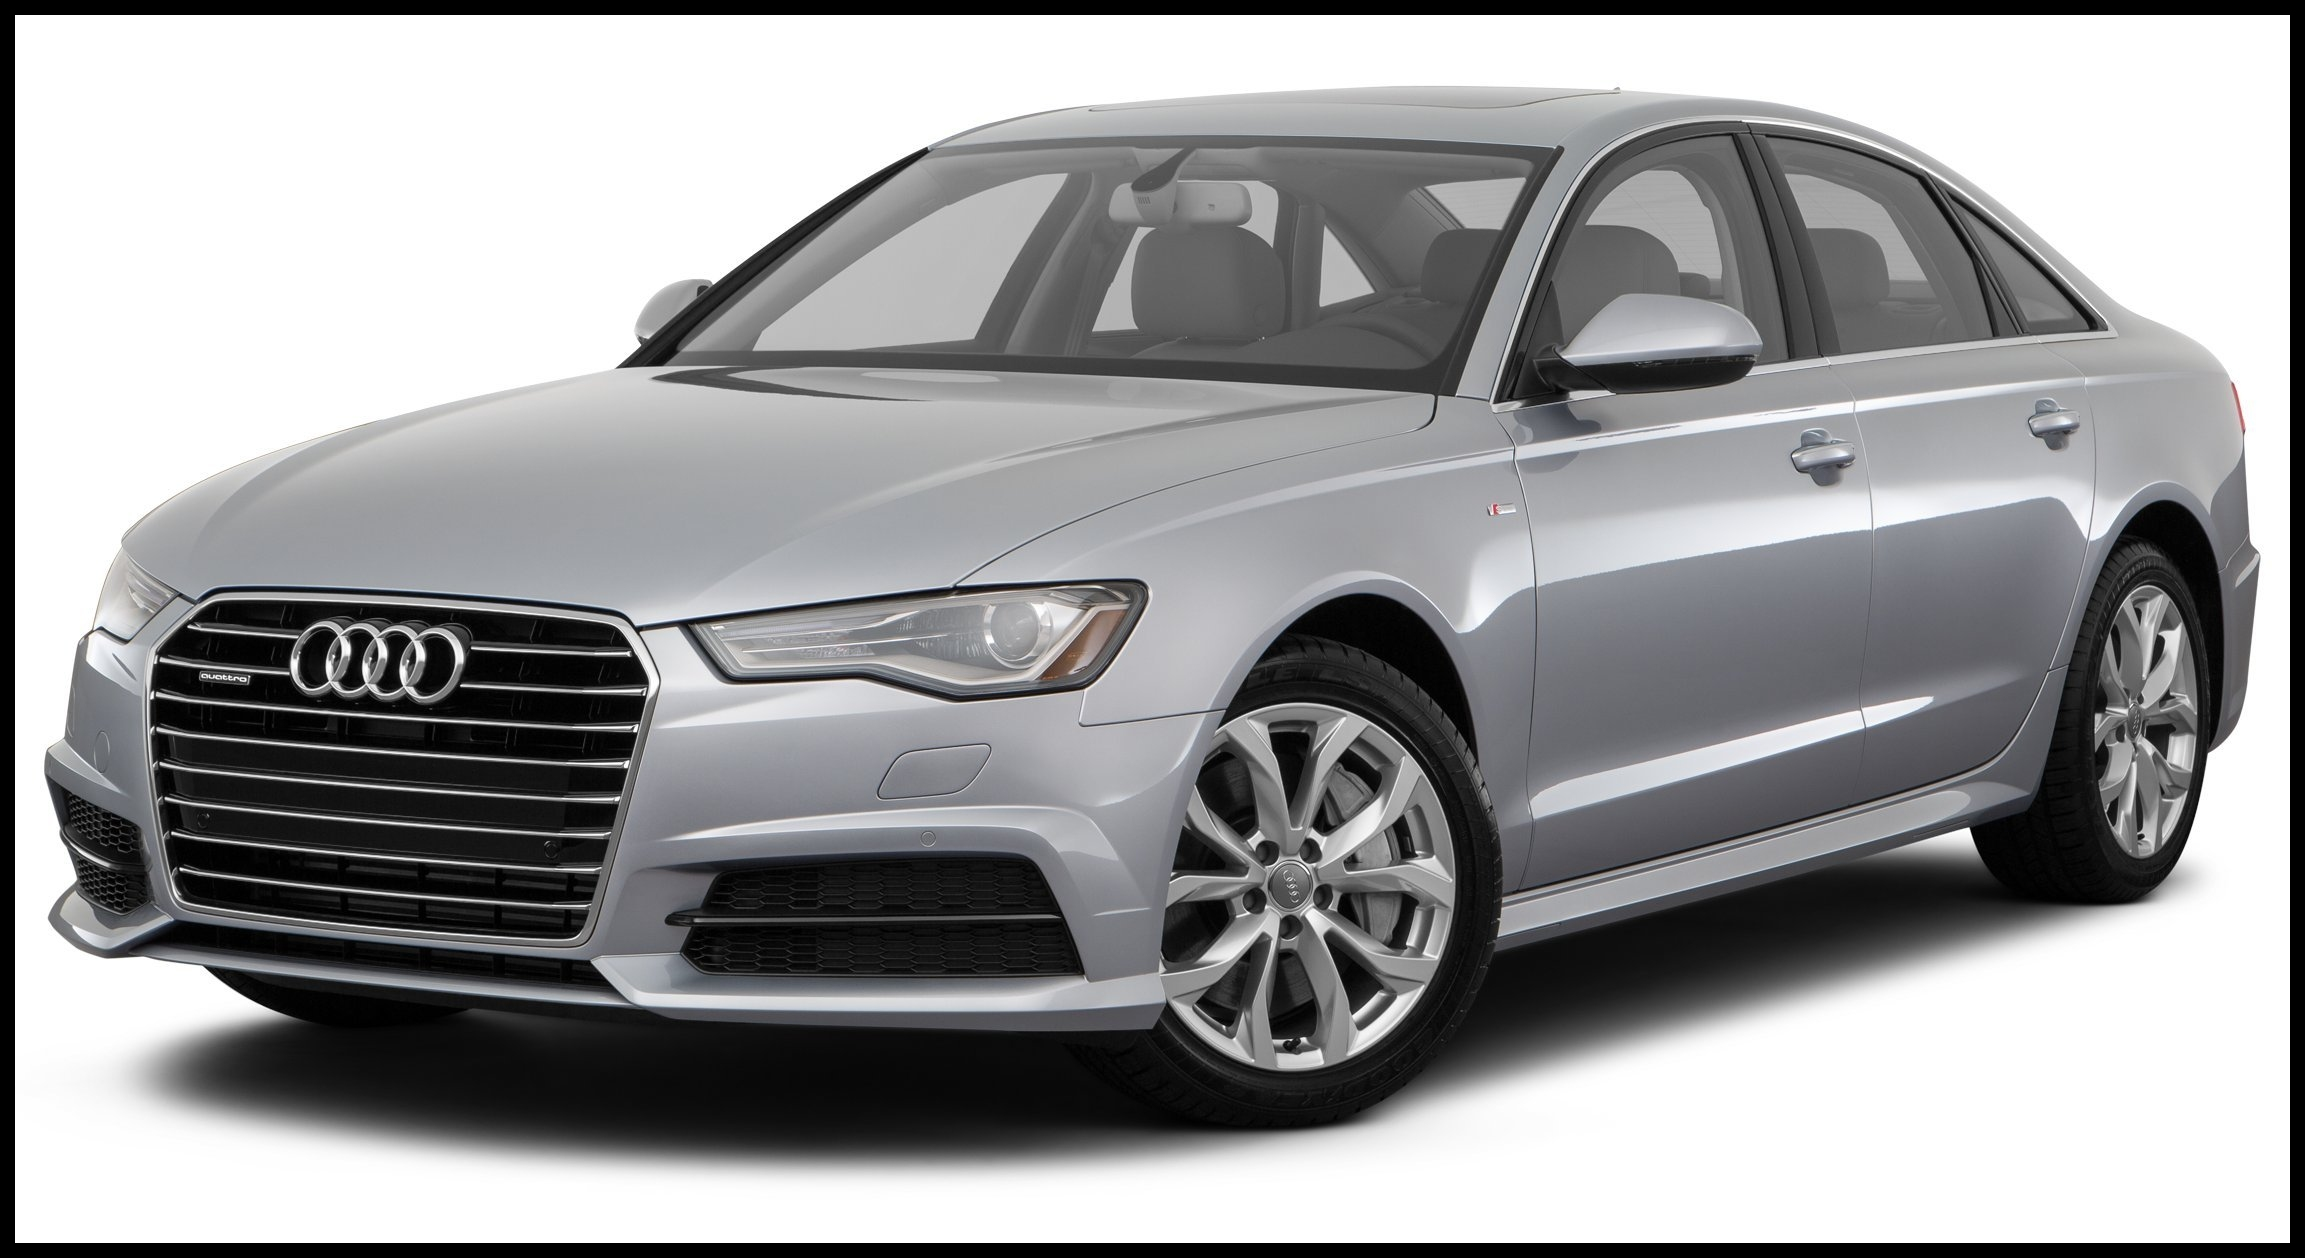 2018 Audi A6 Quattro Premium 2 0 TFSI quattro All Wheel Drive